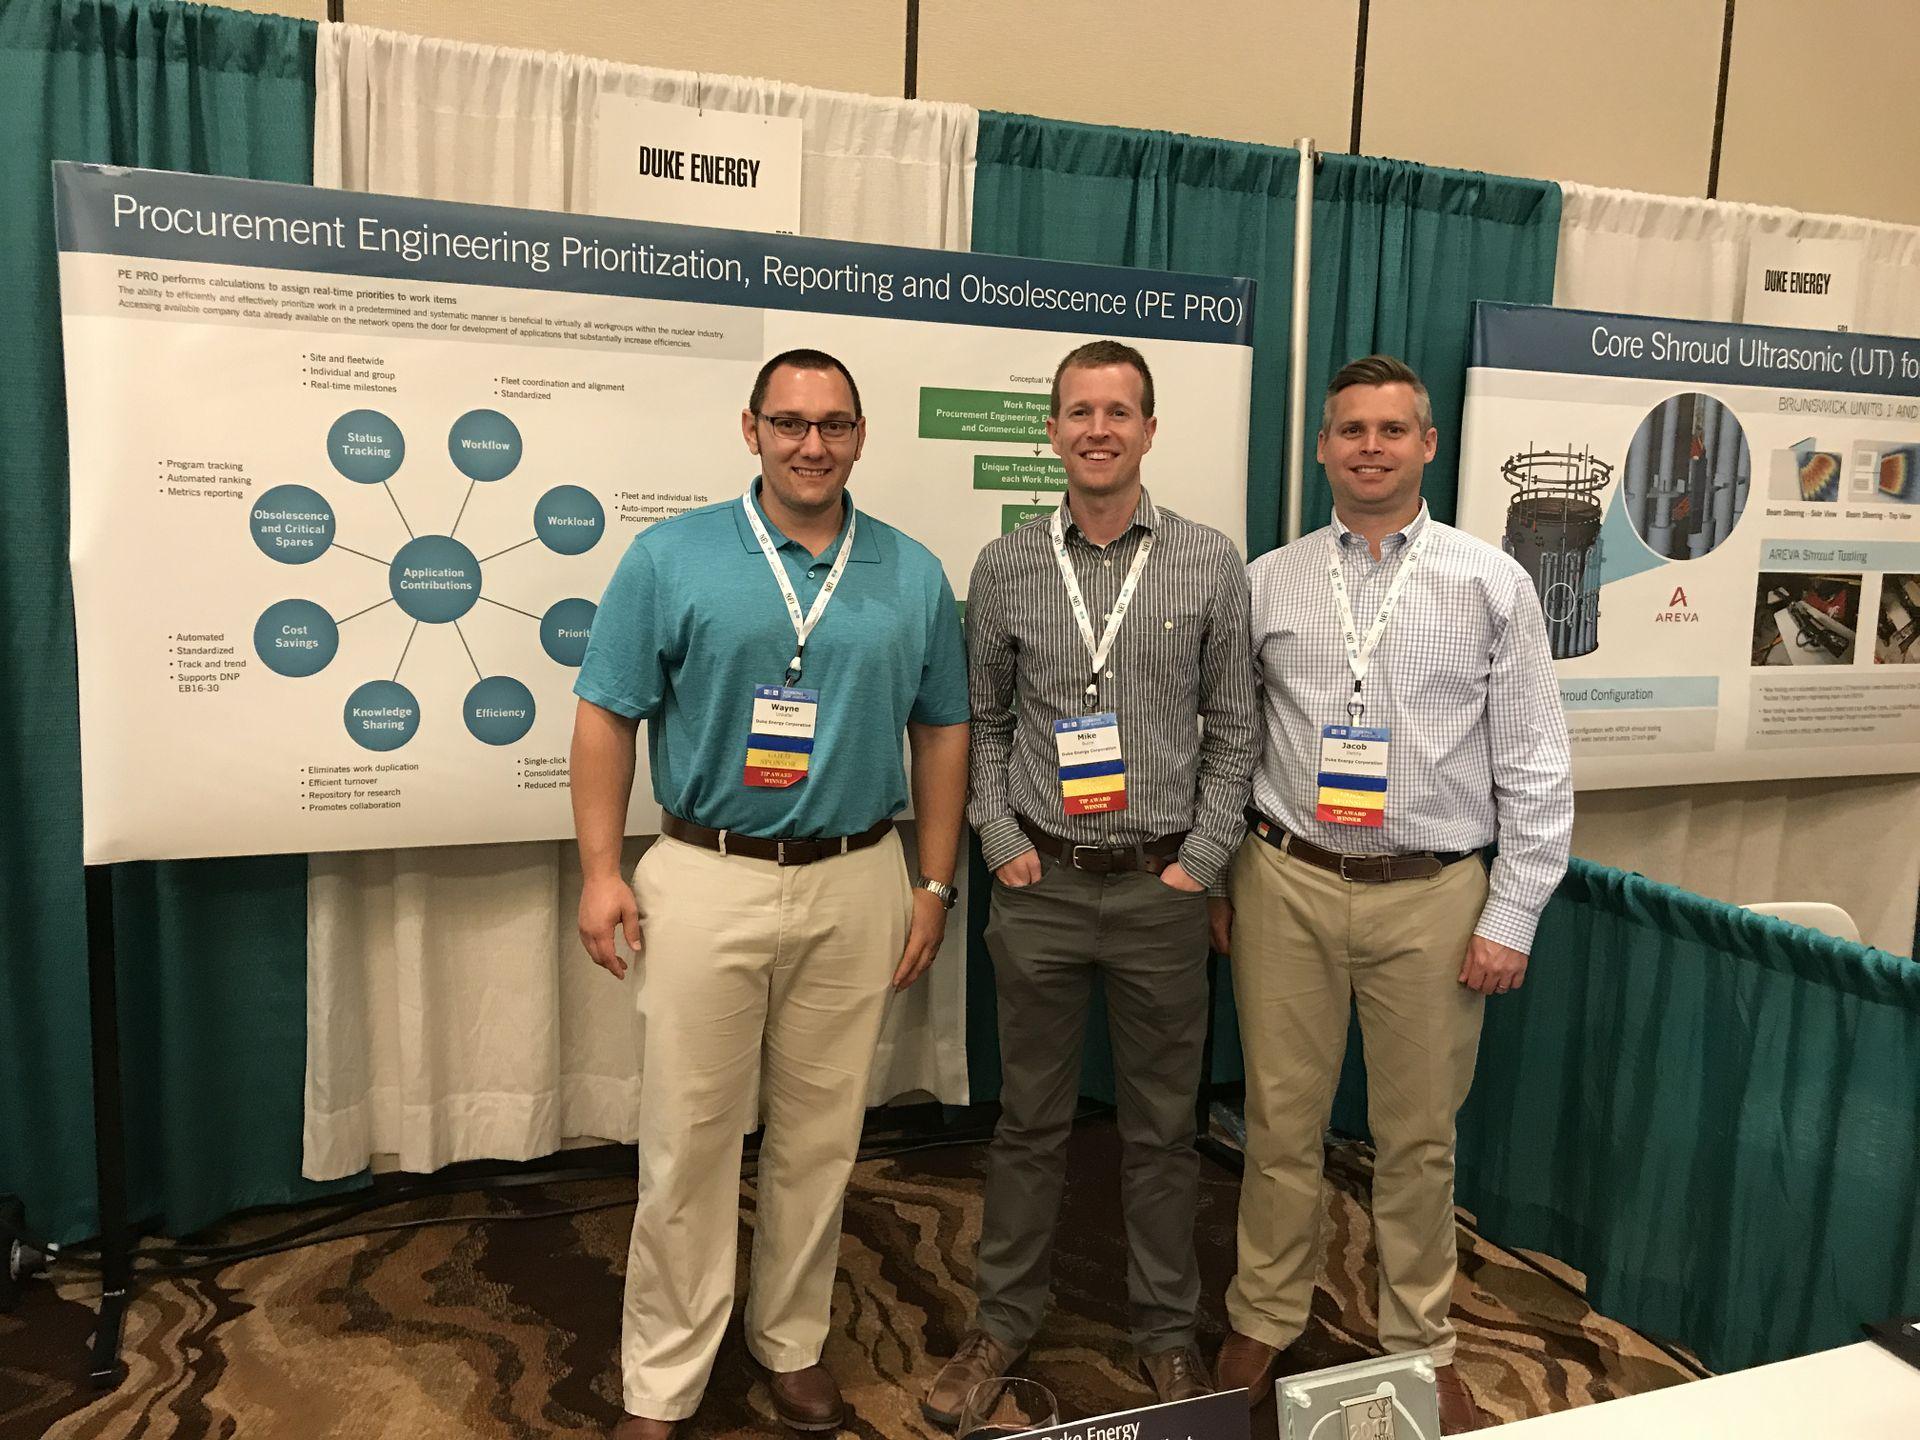 Duke Energy's award-winning Procurement Engineering team at NEA